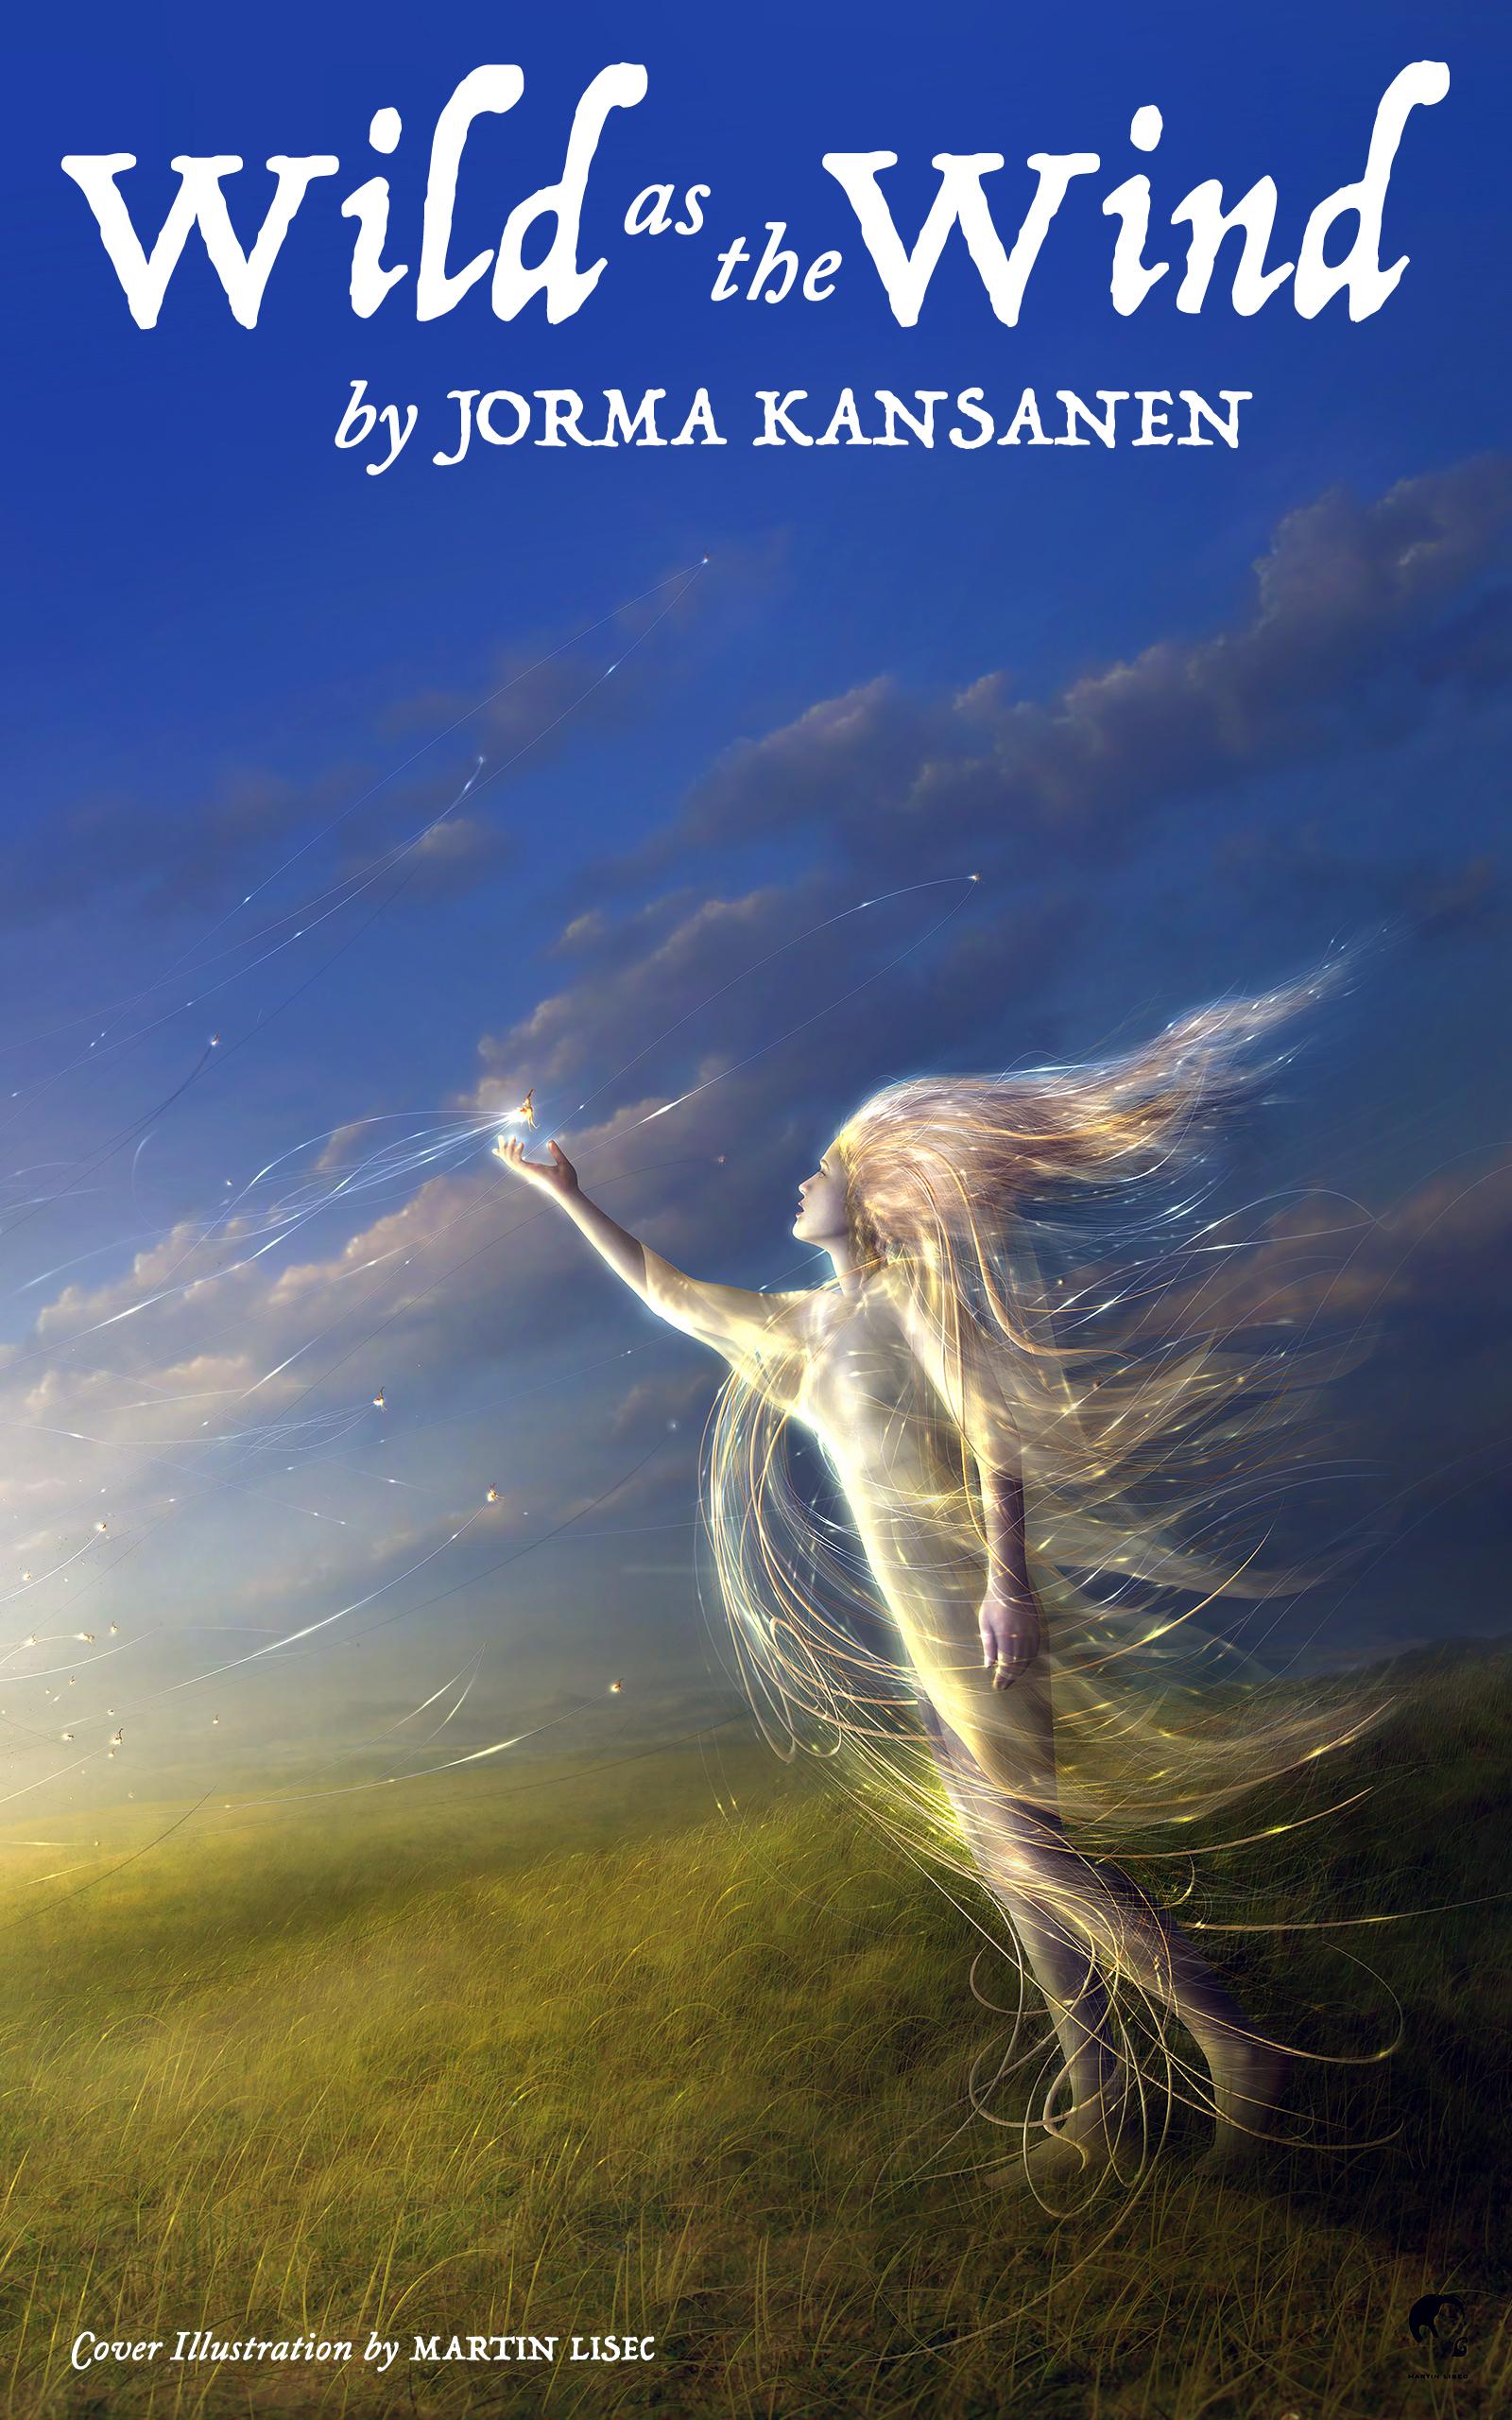 Wild As The Wind by Jorma Kansanen